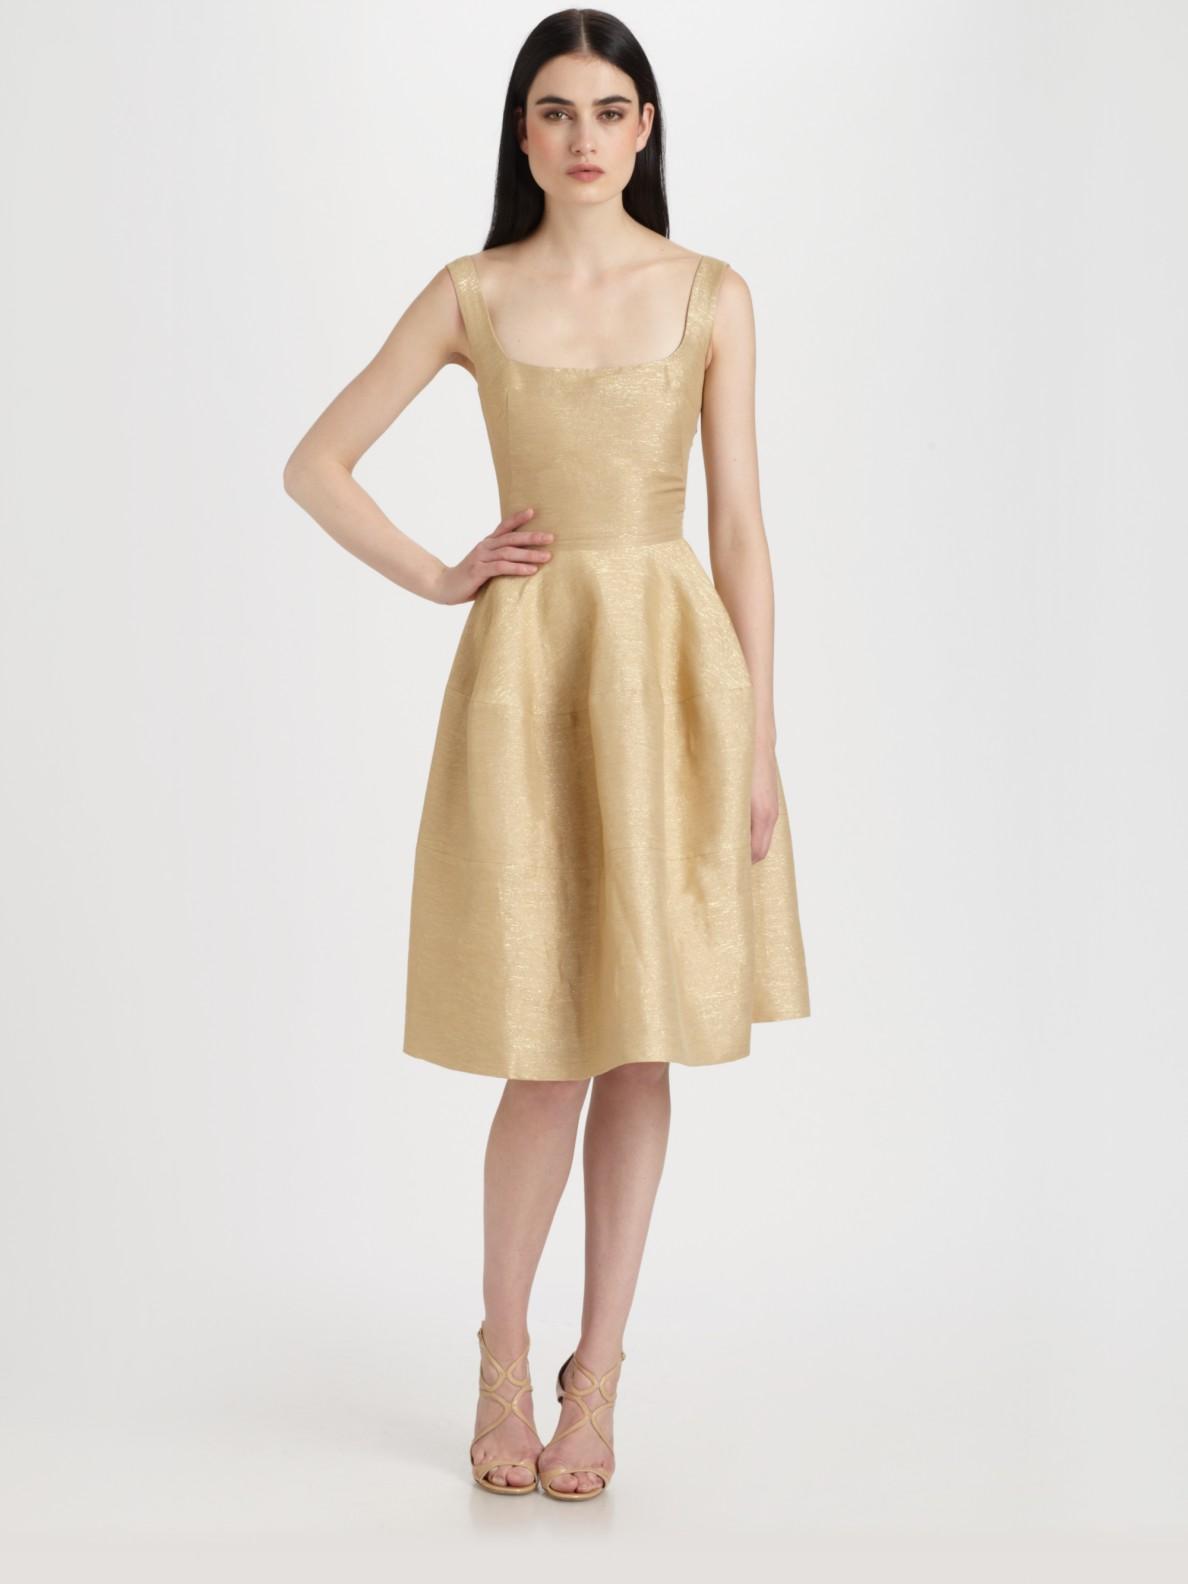 Dress Square Double Thai 100 Viscose: Alexander Mcqueen Square Neck Dress In Metallic